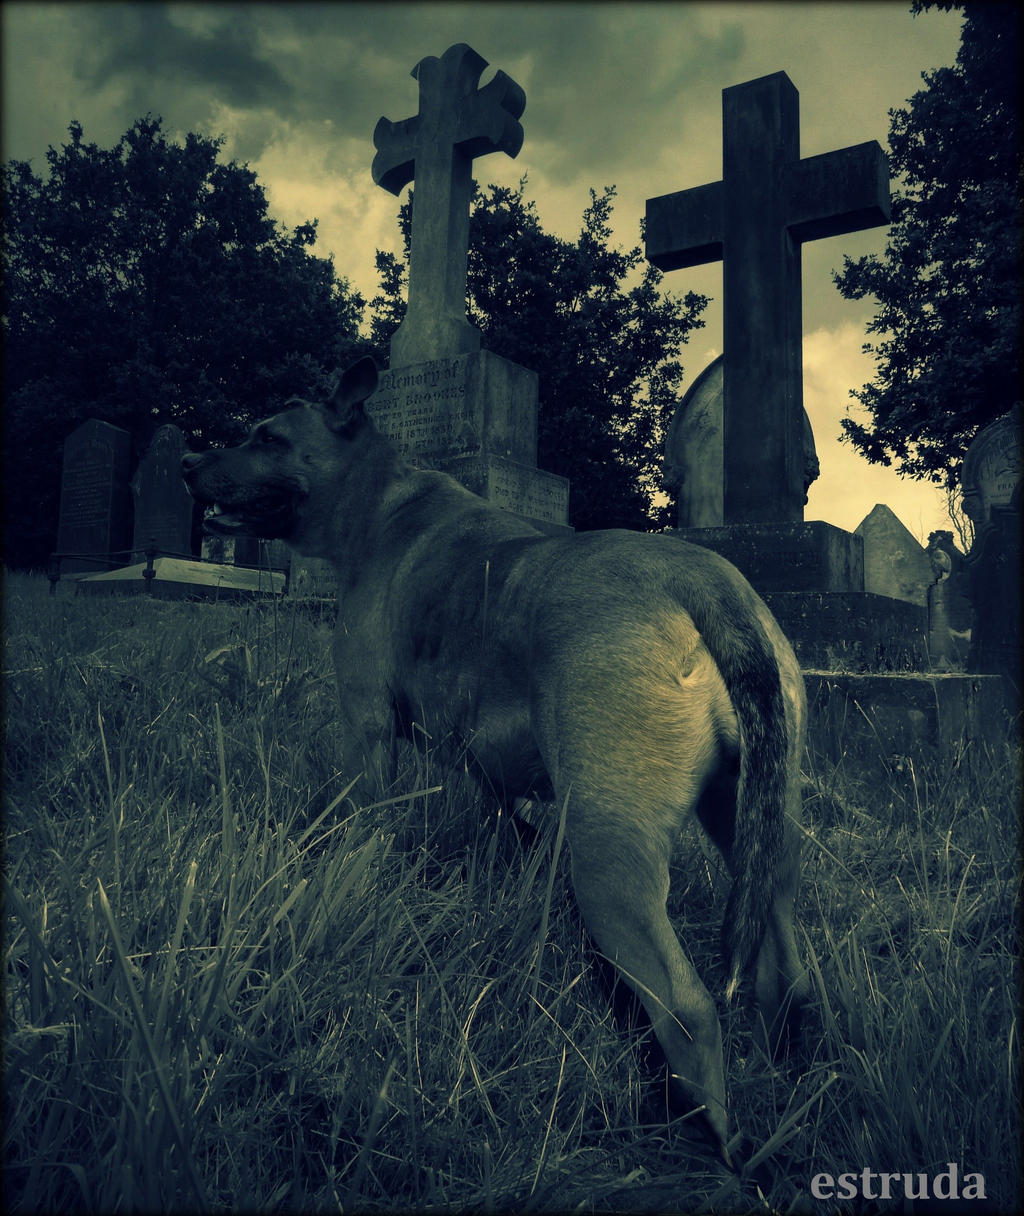 Guardian Of The Dead by Estruda